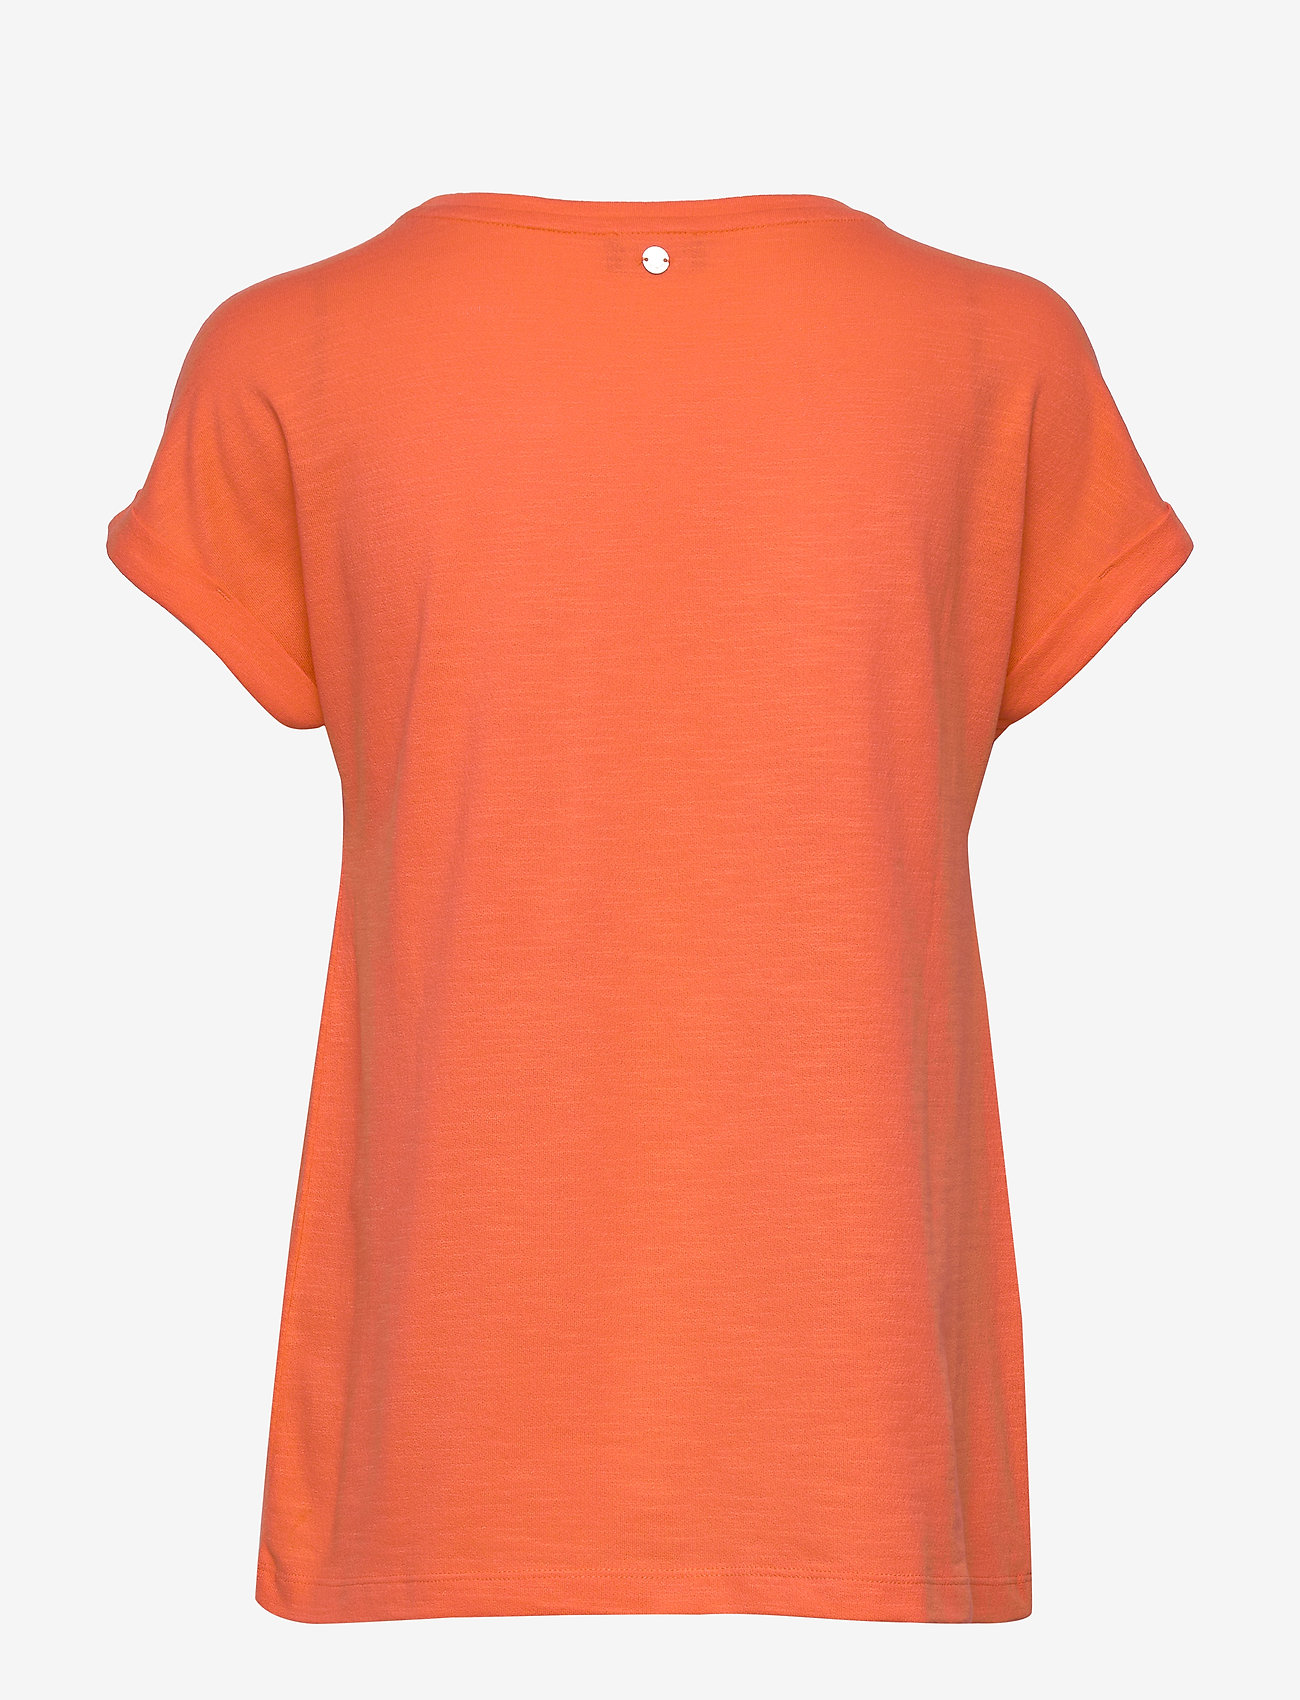 Taifun - T-SHIRT SHORT-SLEEVE - t-shirts - tigerlilly orange - 1